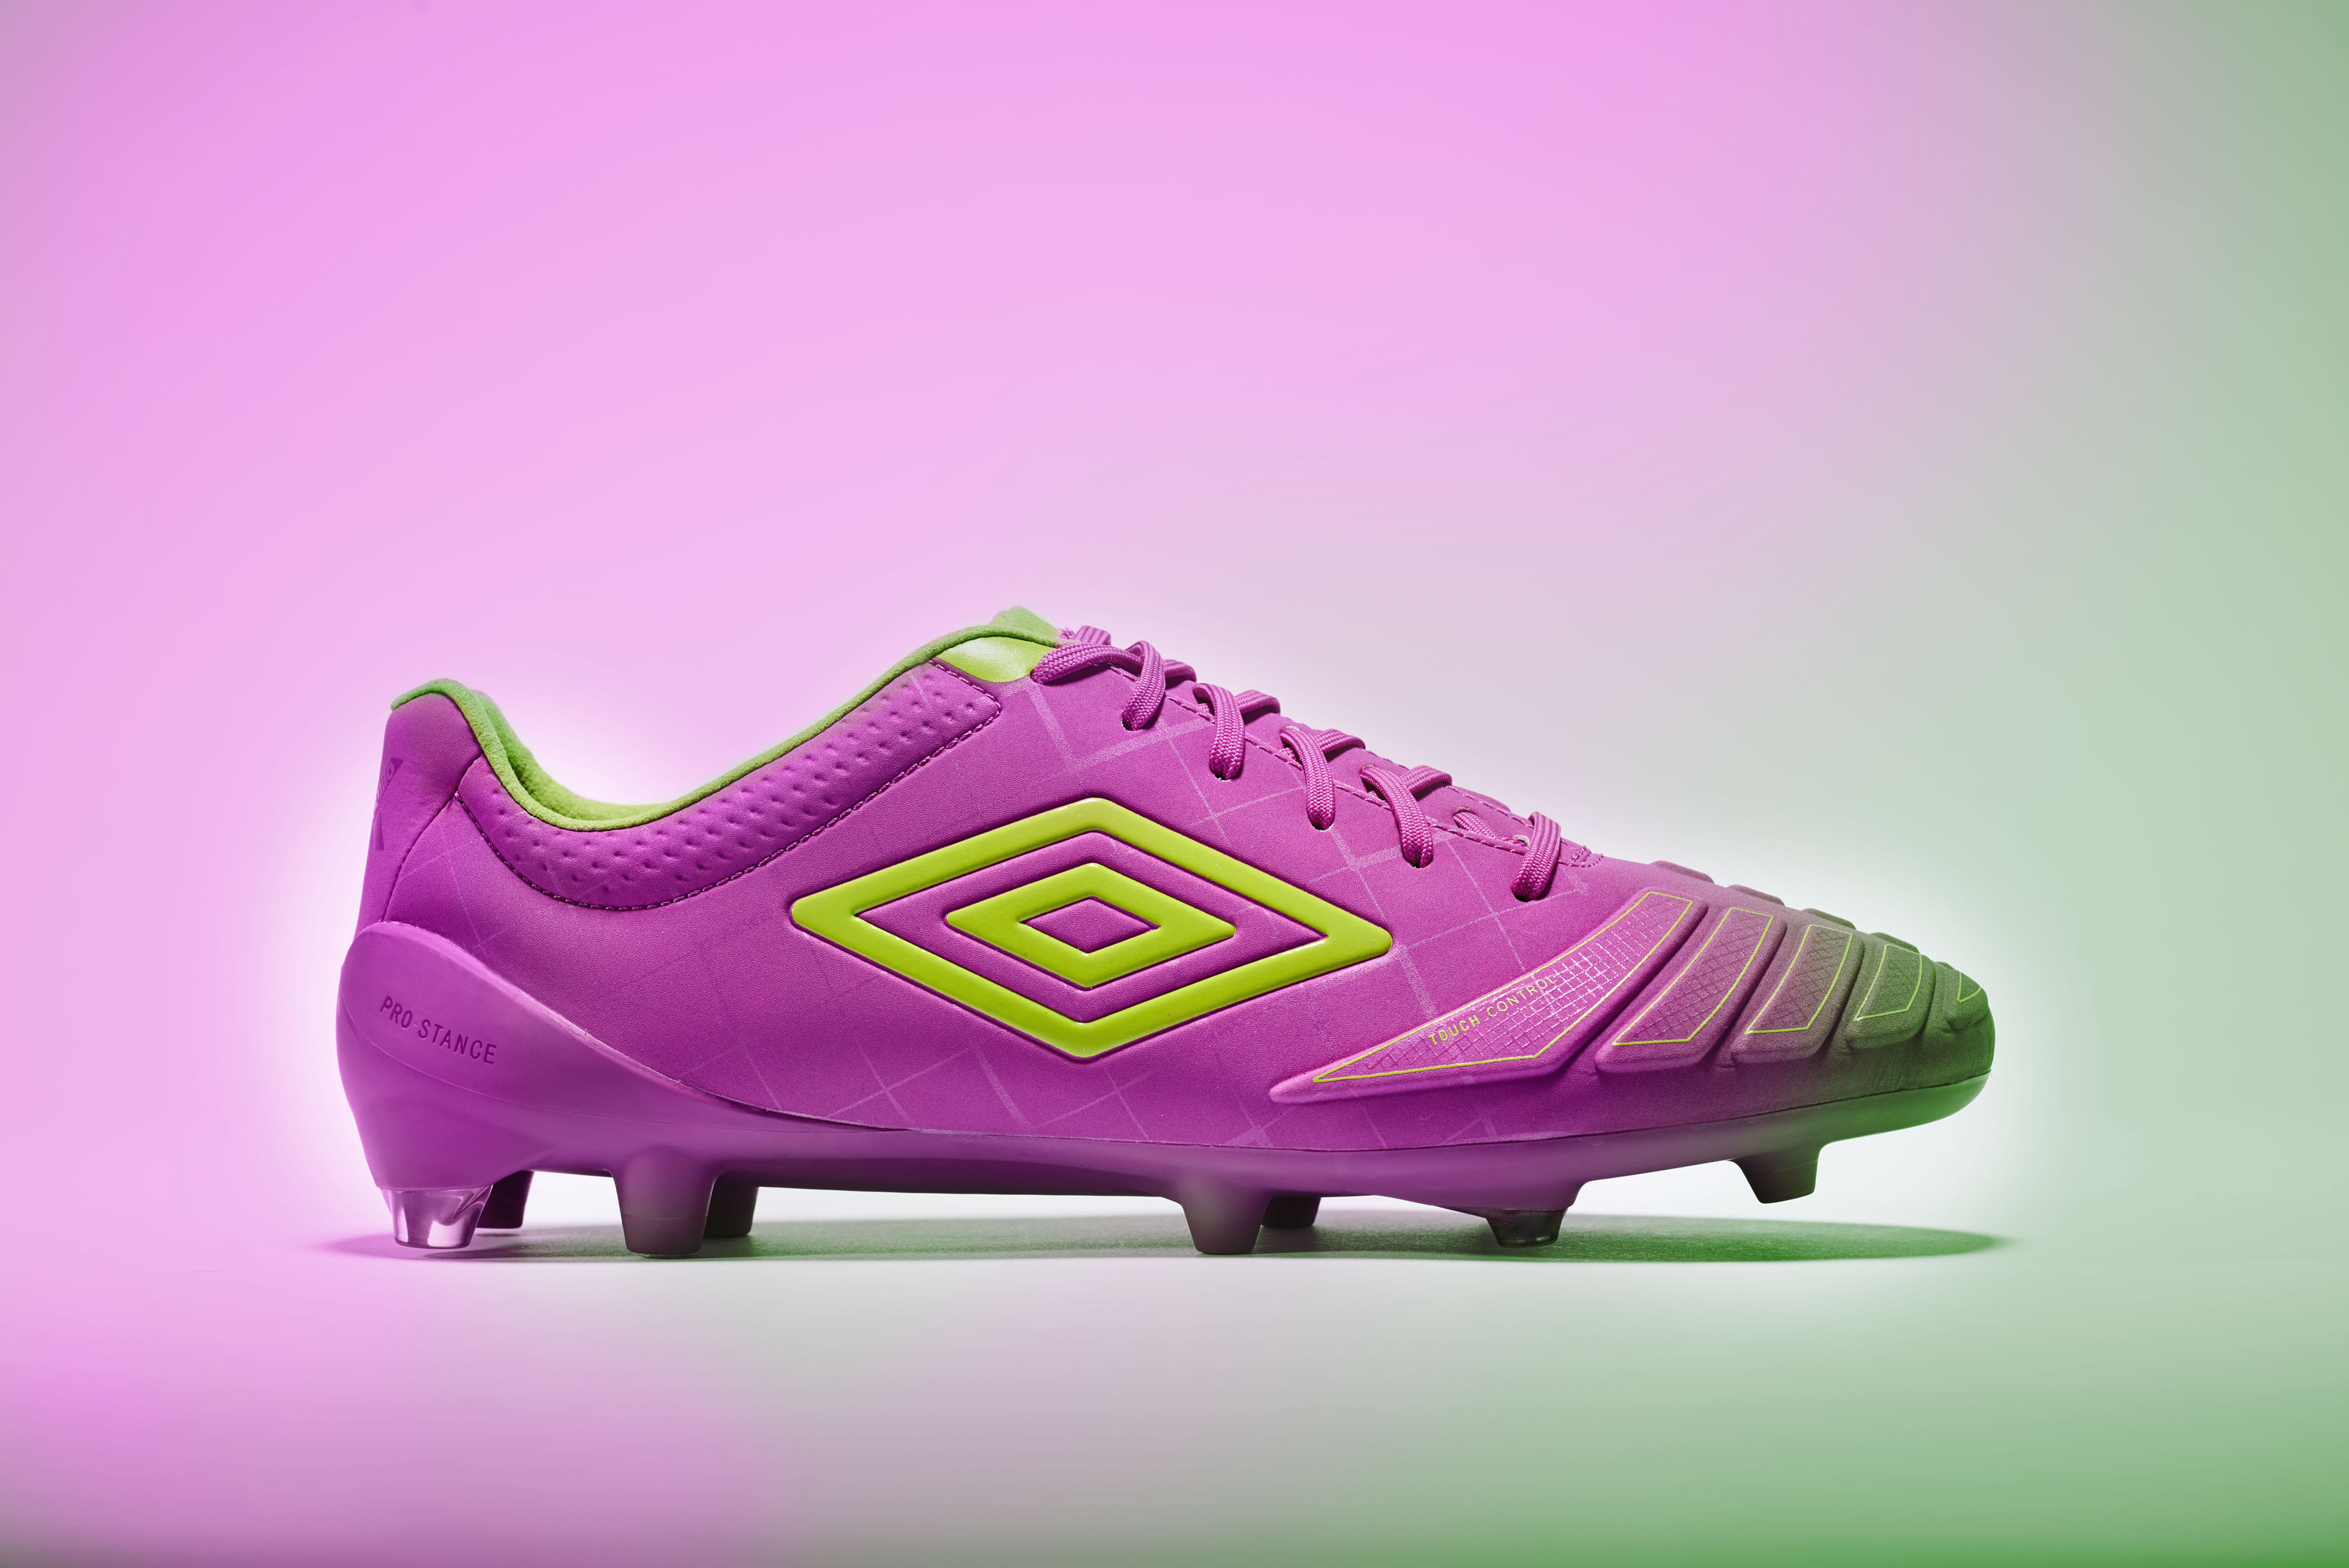 ms_umbro_aw16_accuro_purple_colour_004